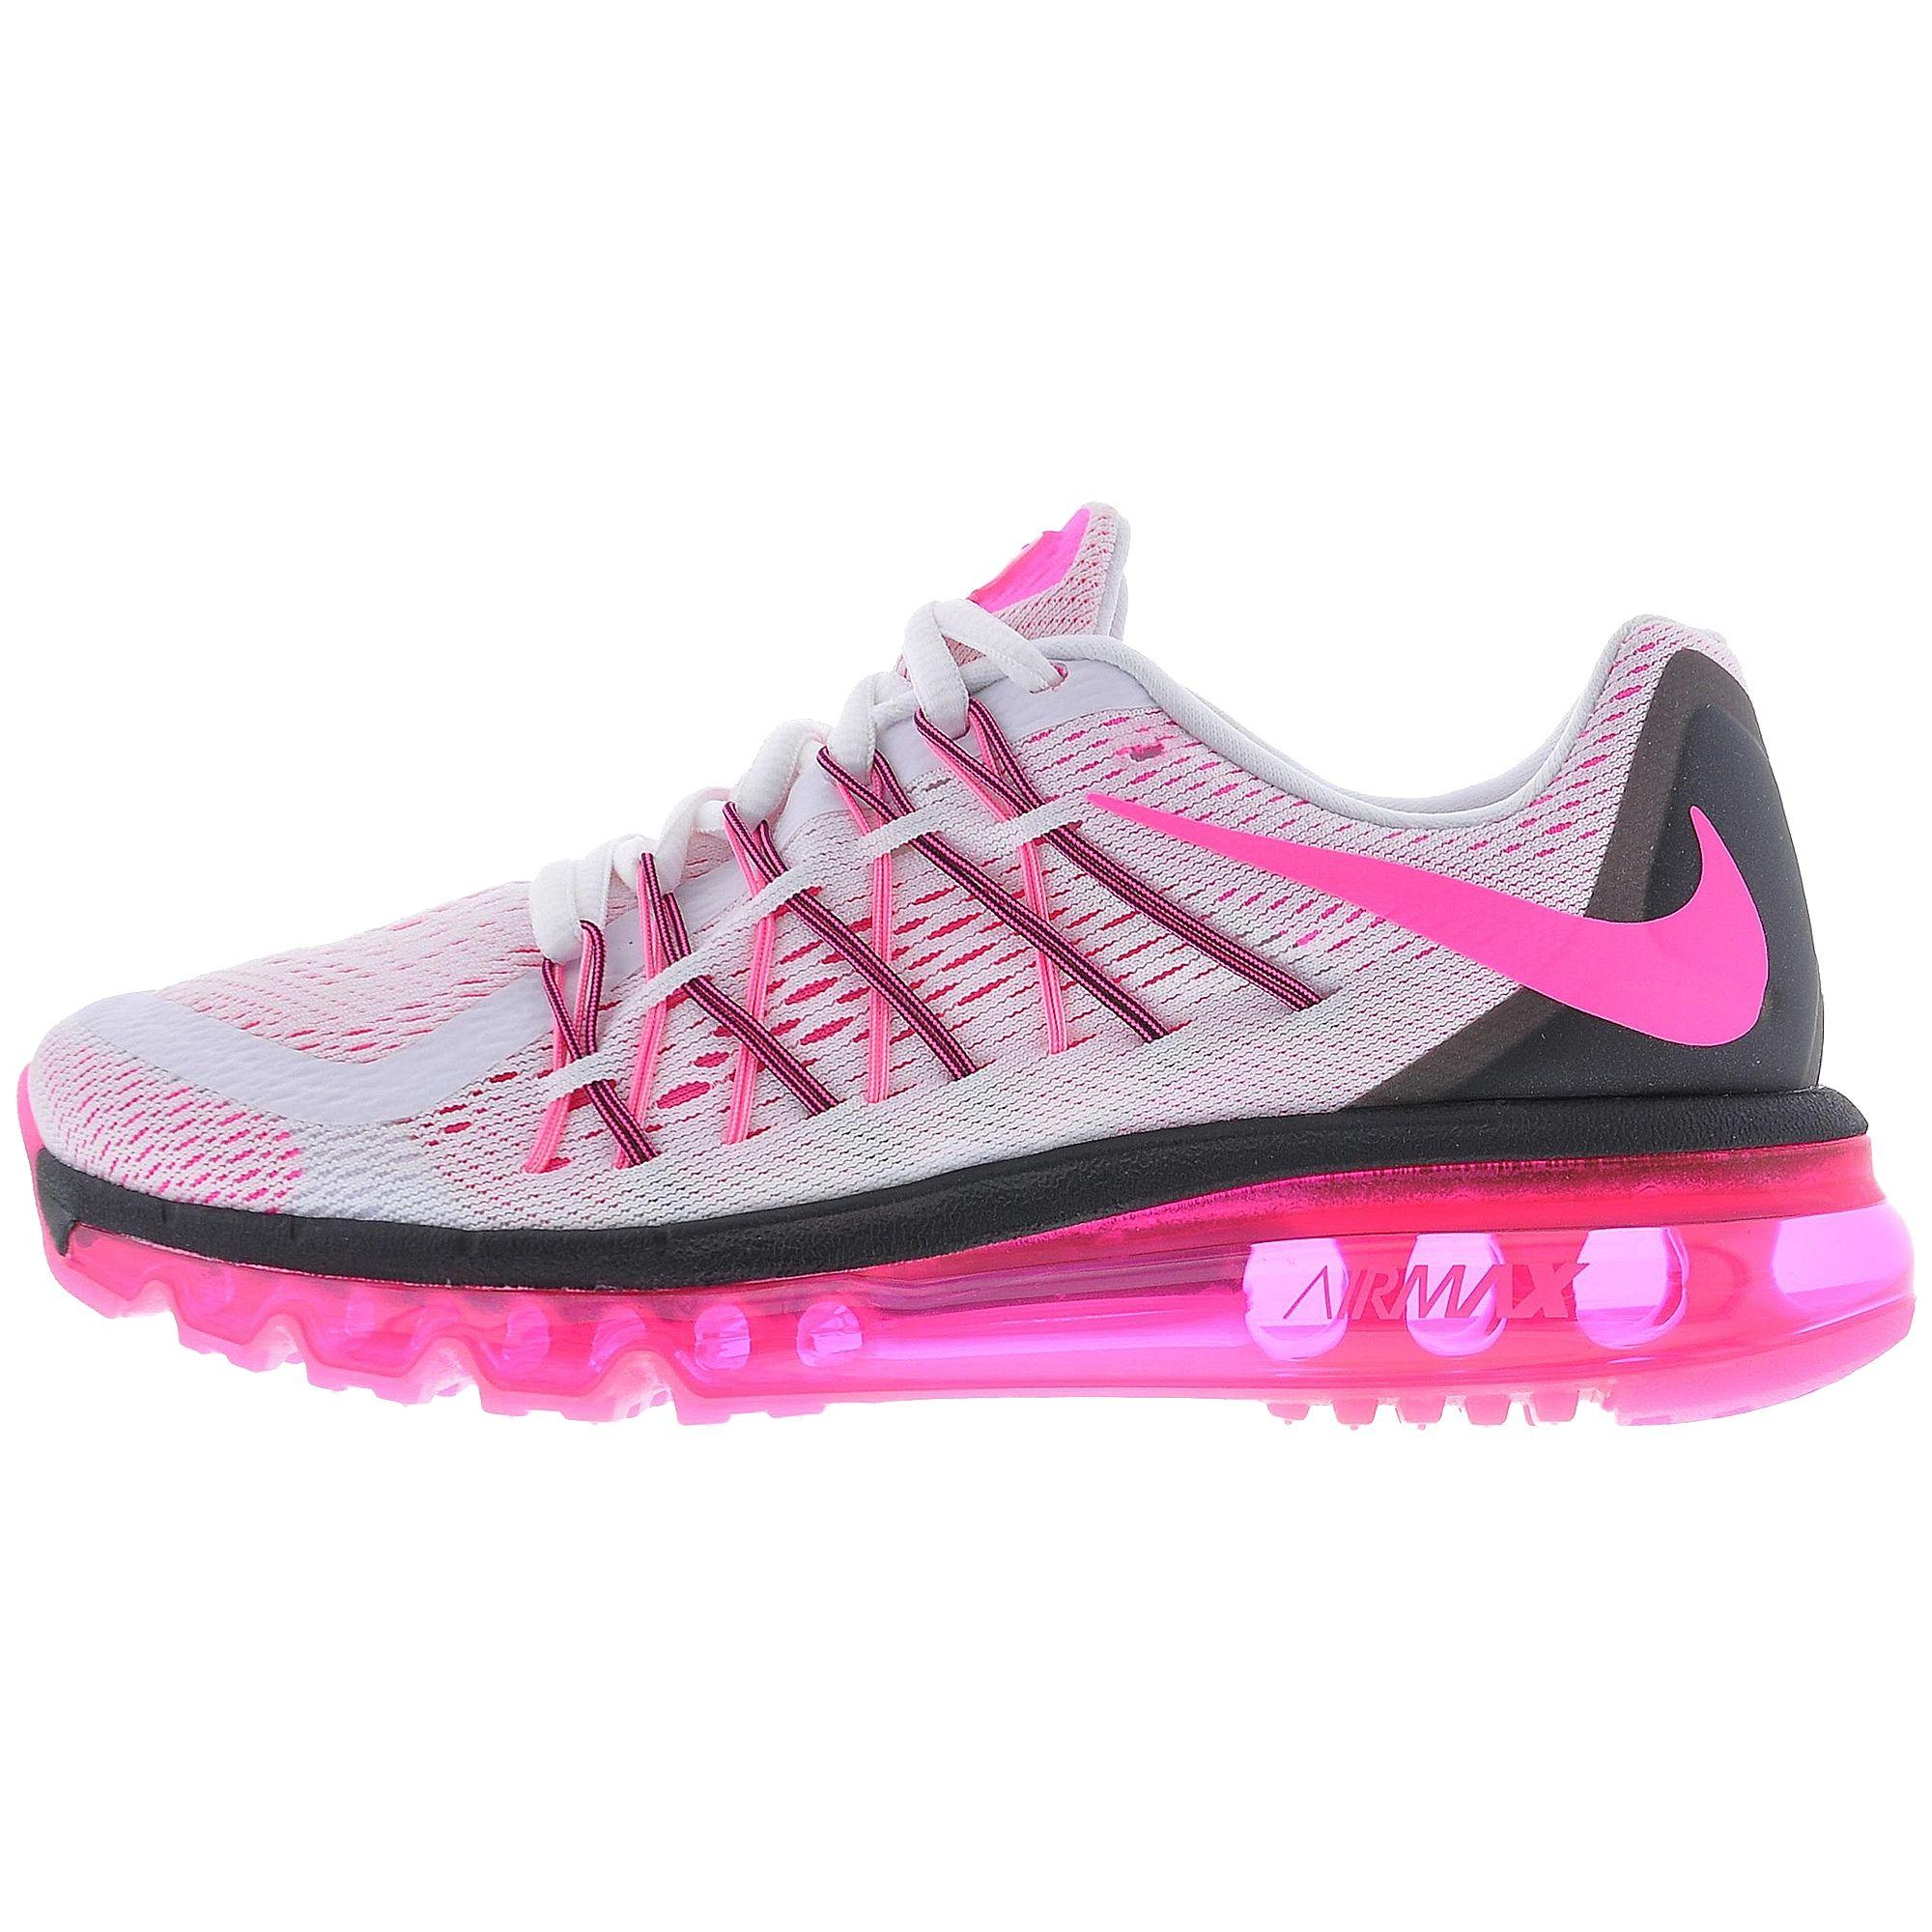 Con temperamento Planeta  Nike Air Max 2015 Spor Ayakkabı | Adidas shoes outlet, Nike free shoes, Nike  fashion